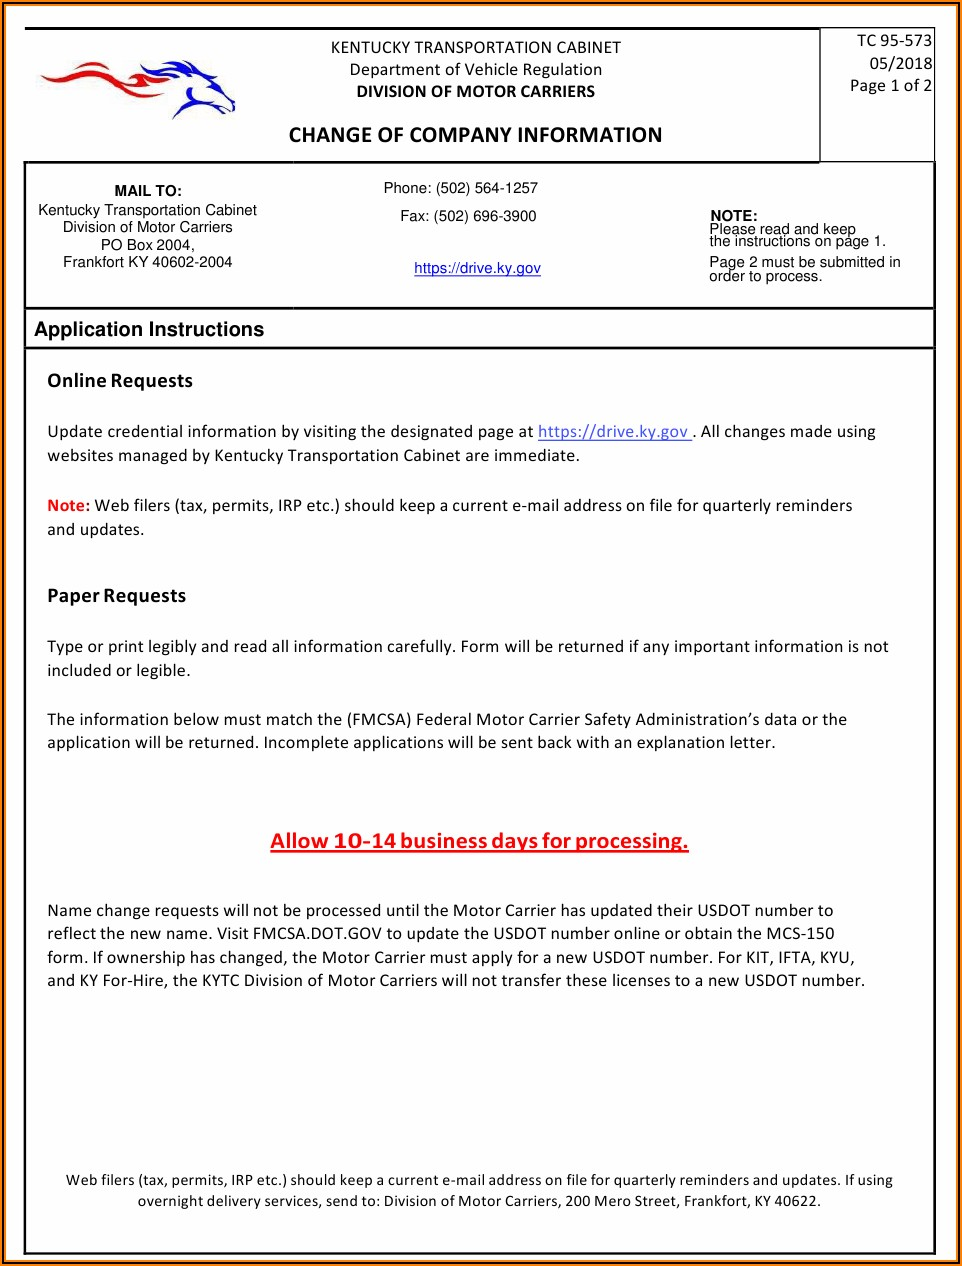 Update Mcs 150 Form Online